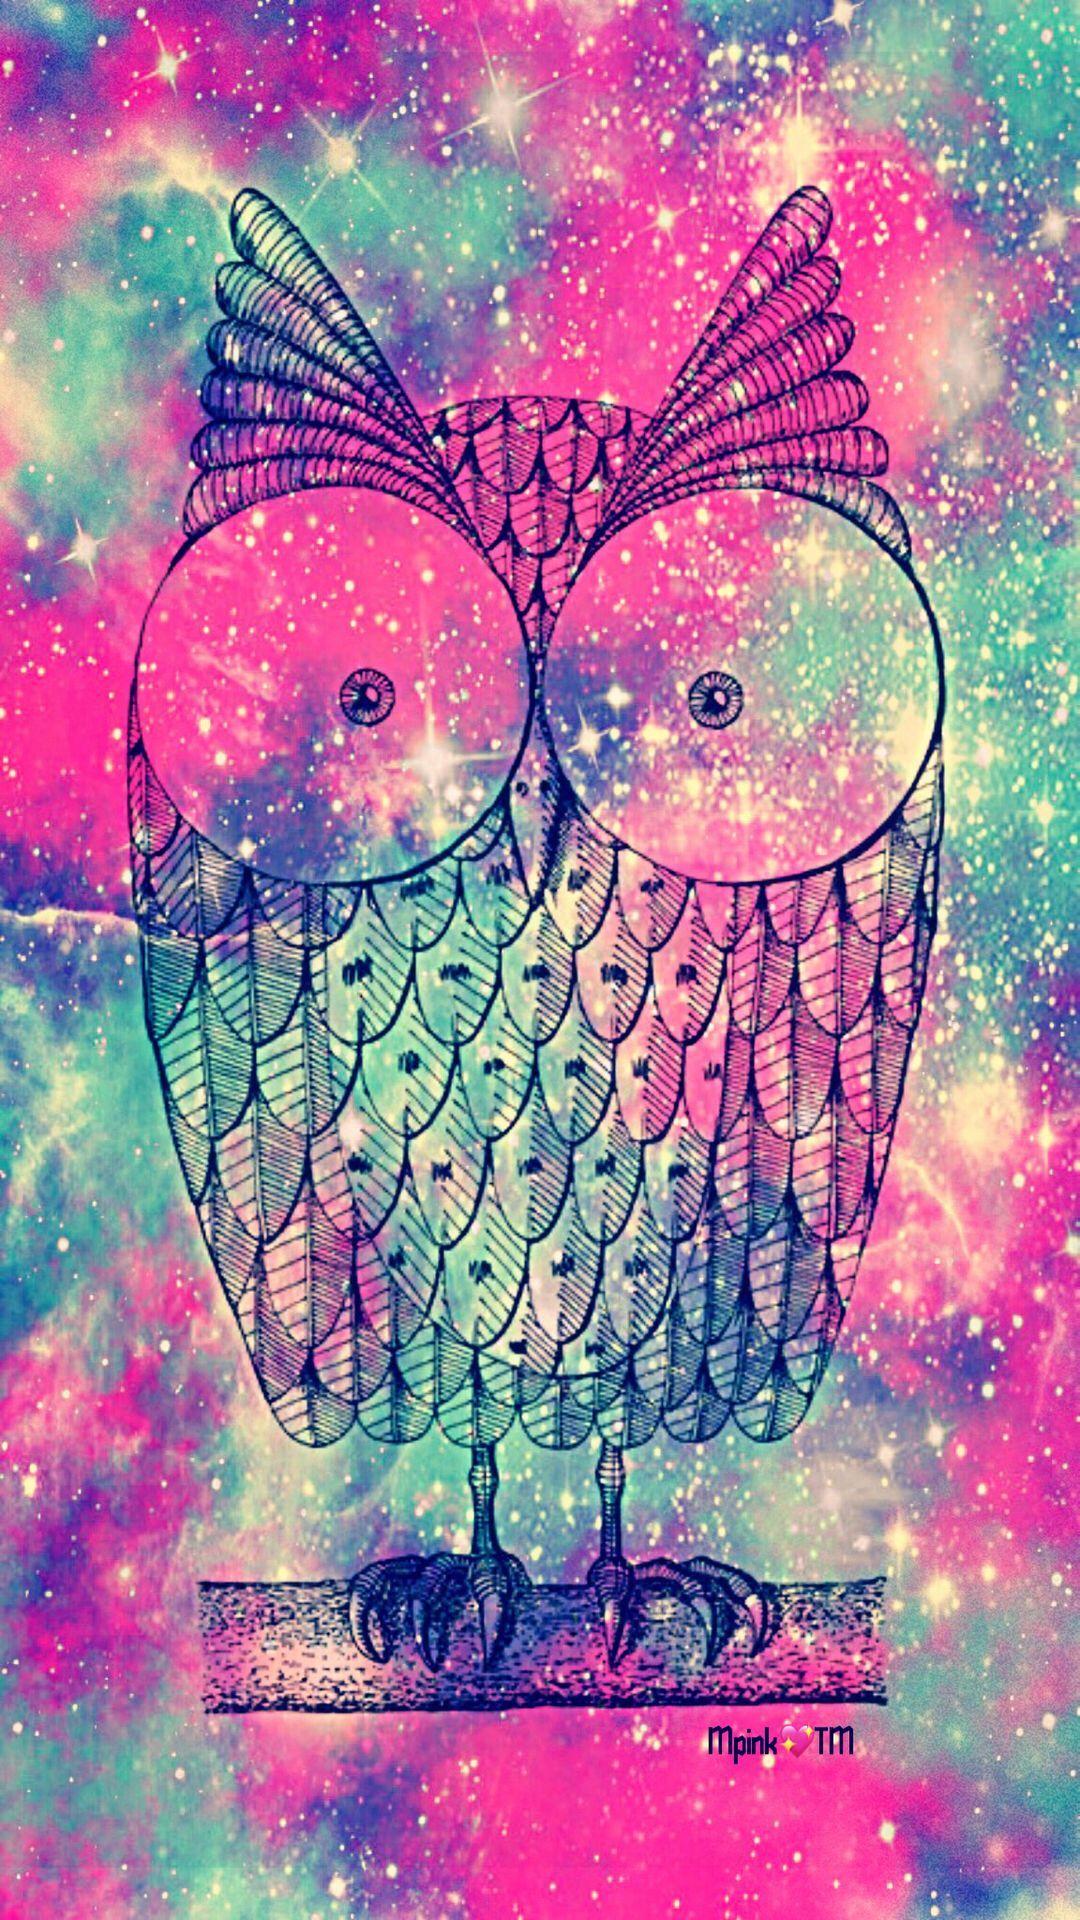 Colorful Owl Wallpaper Mobile Owl Wallpaper Pink Wallpaper Iphone Owl Wallpaper Iphone